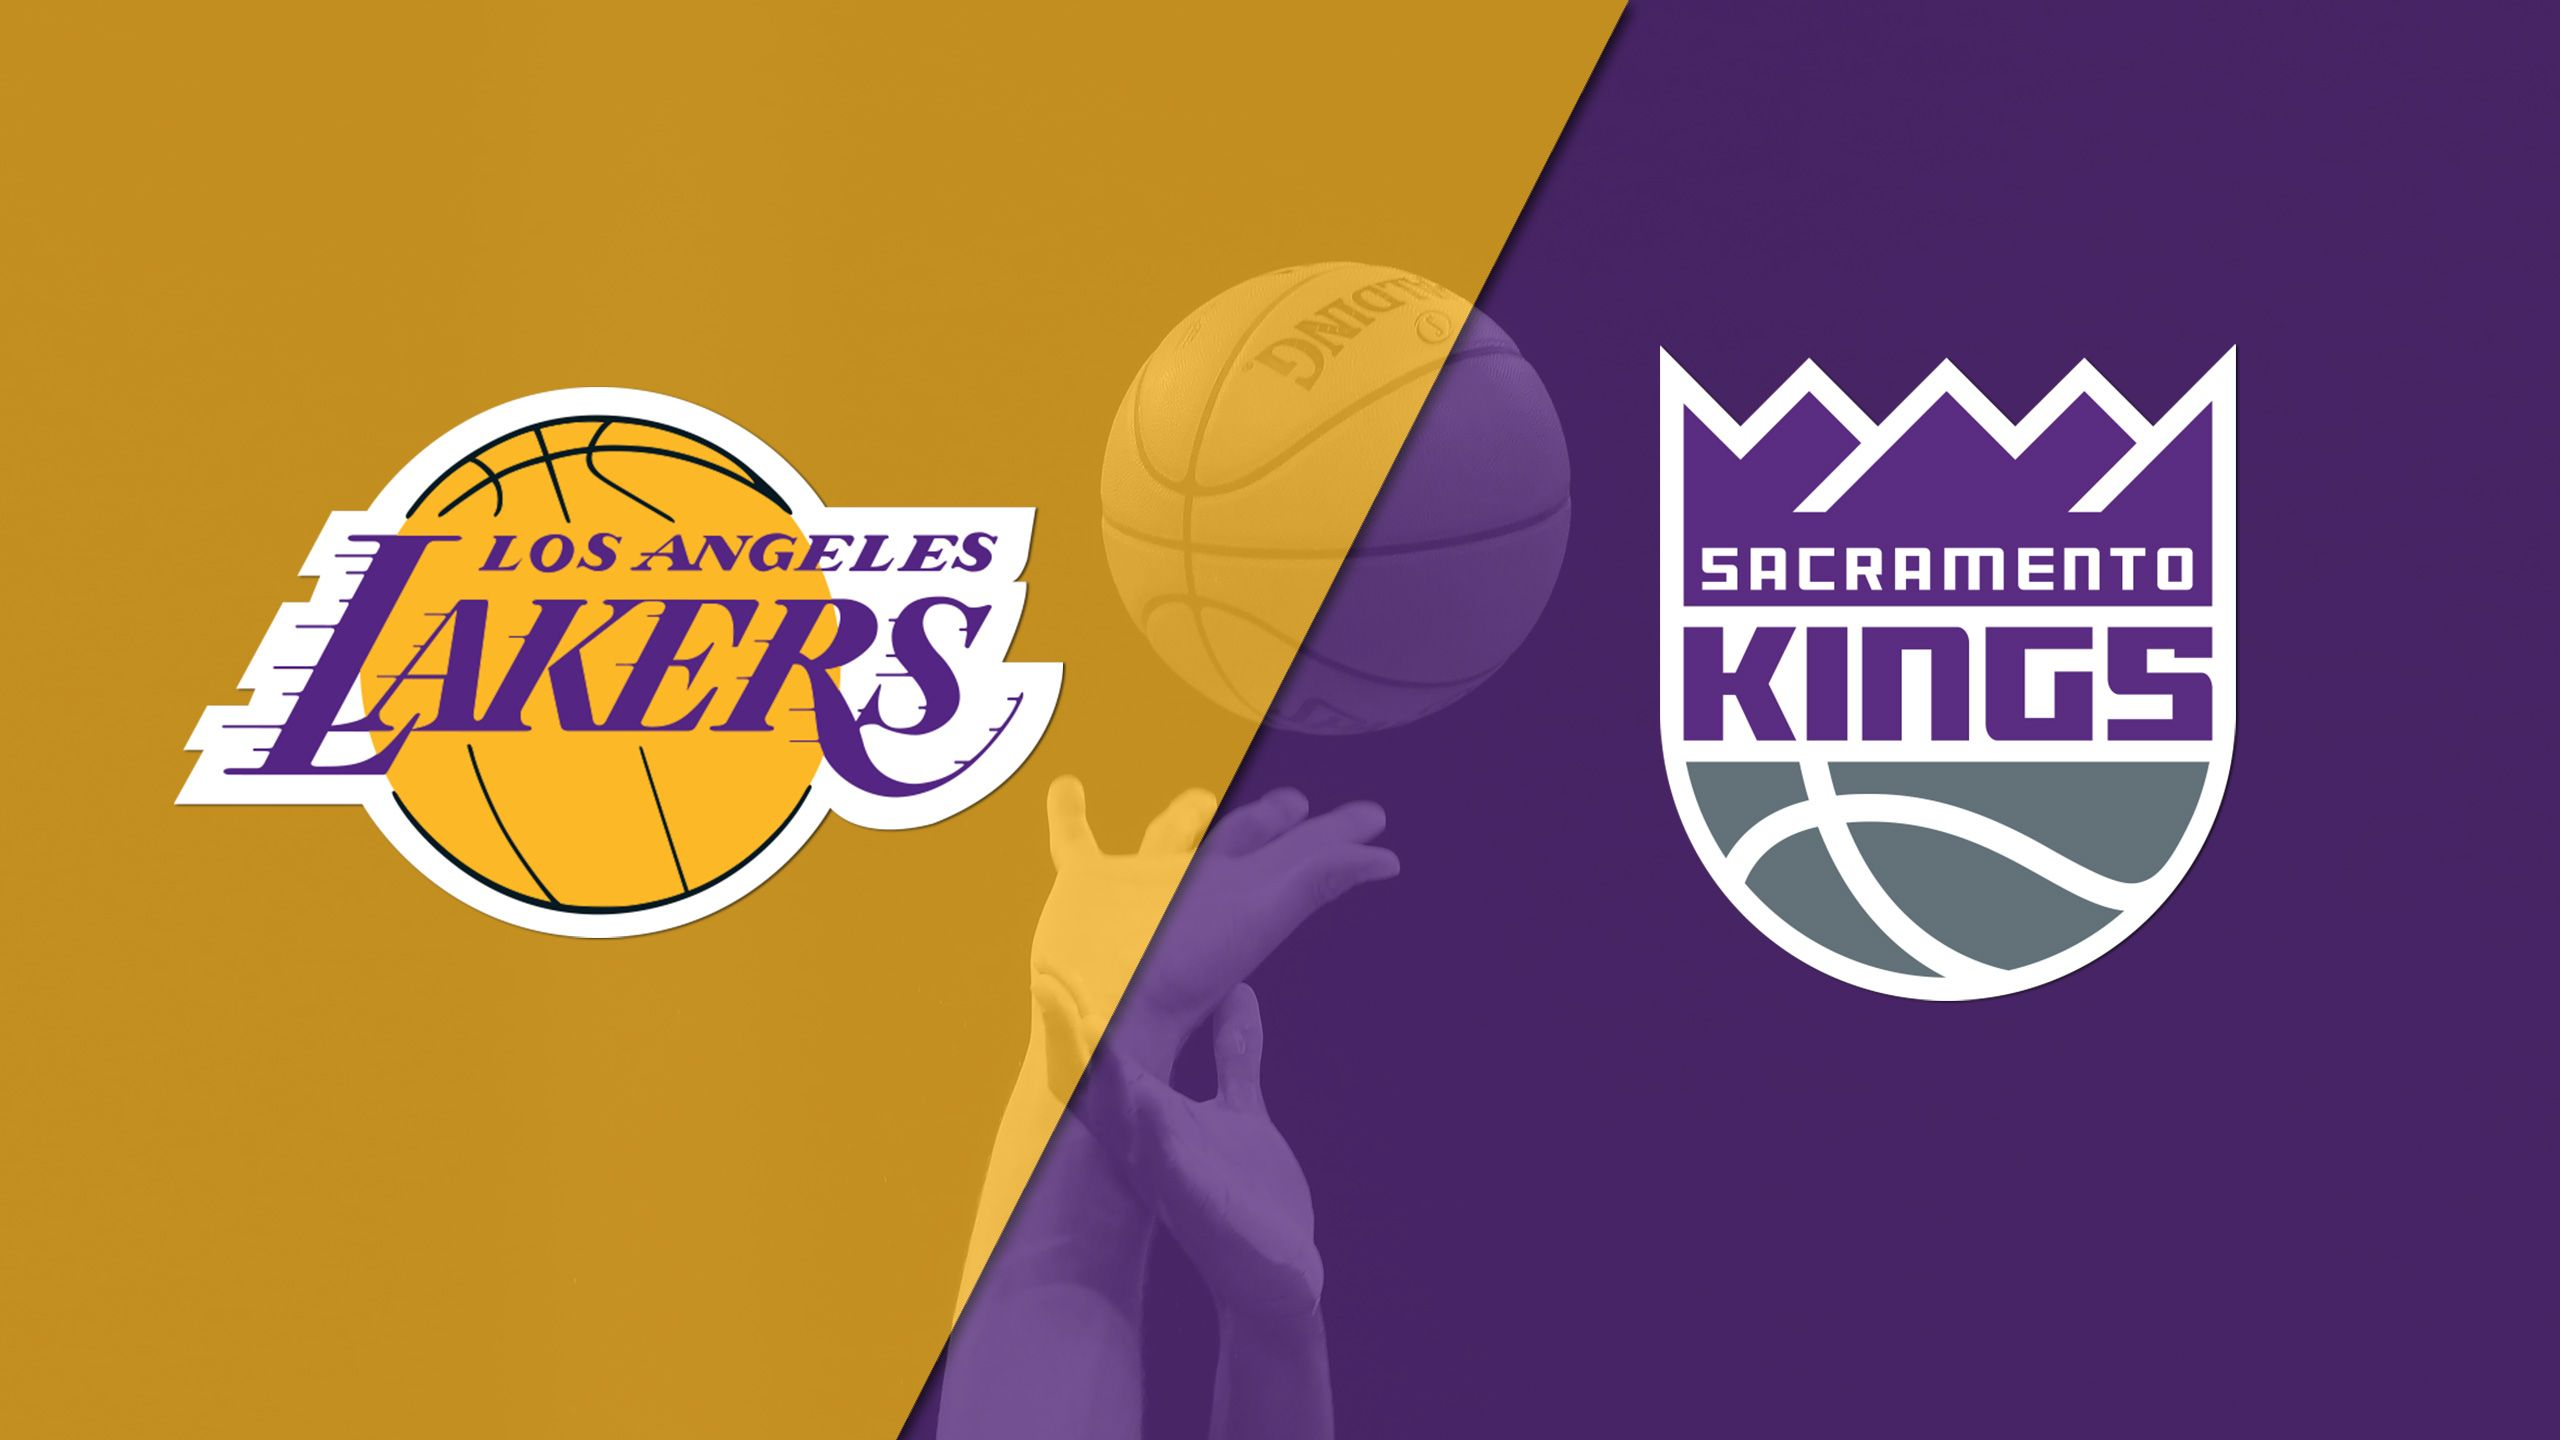 In Spanish - Los Angeles Lakers vs. Sacramento Kings